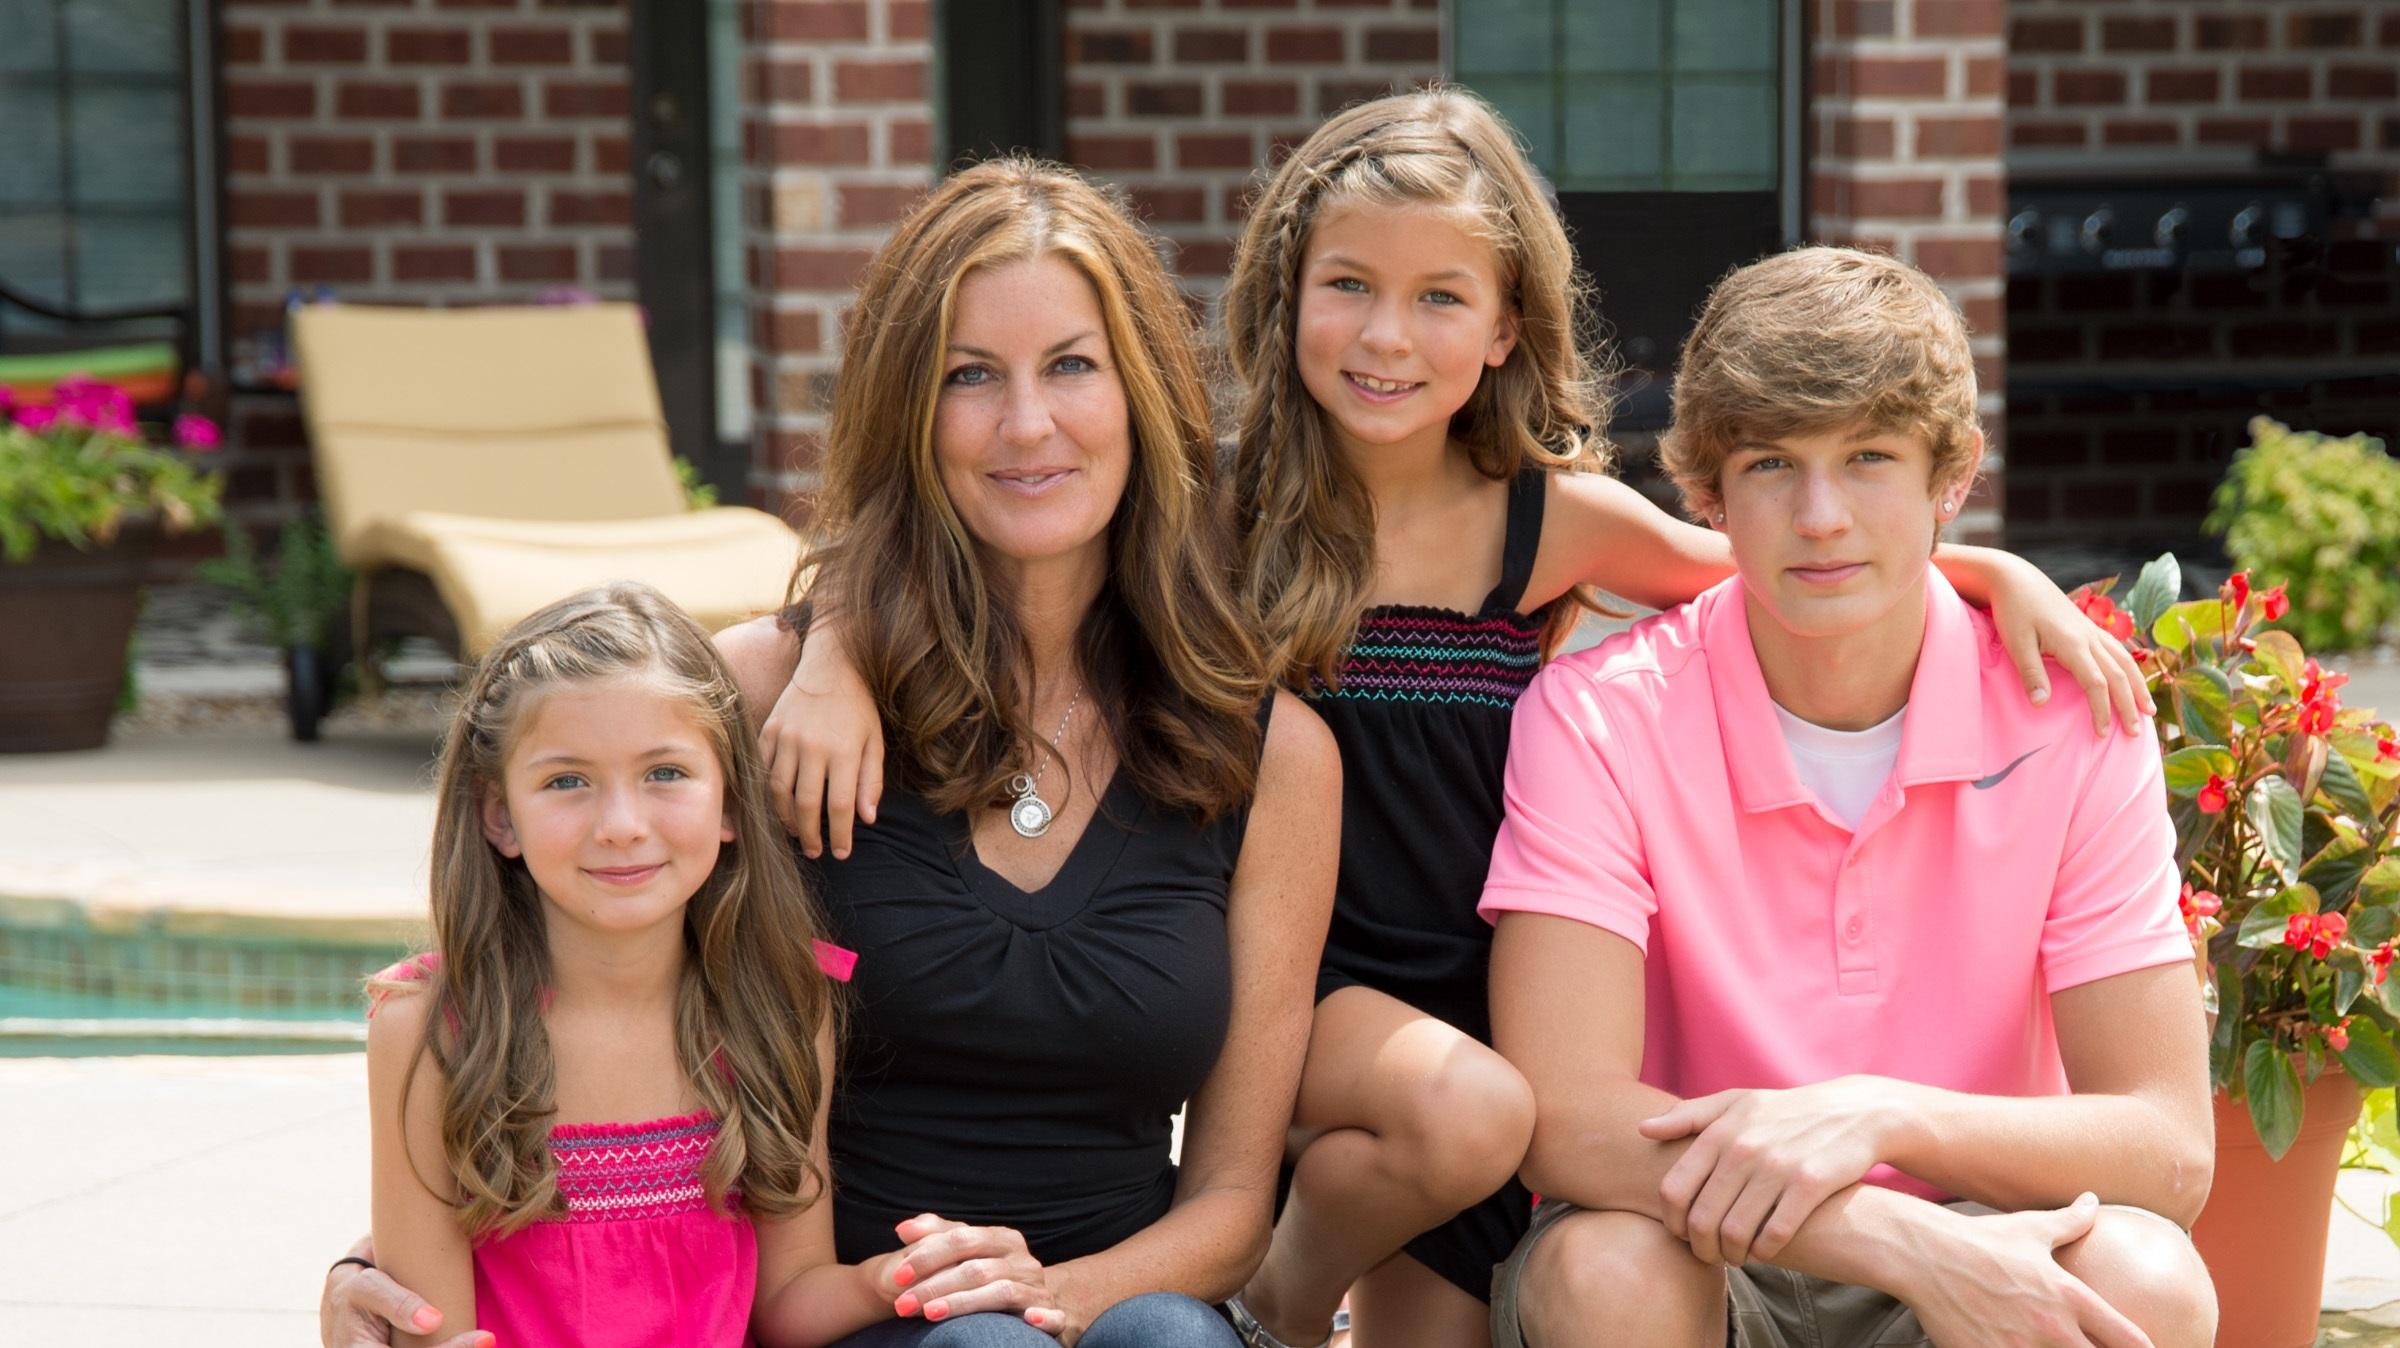 madra jones family itworks millionaire